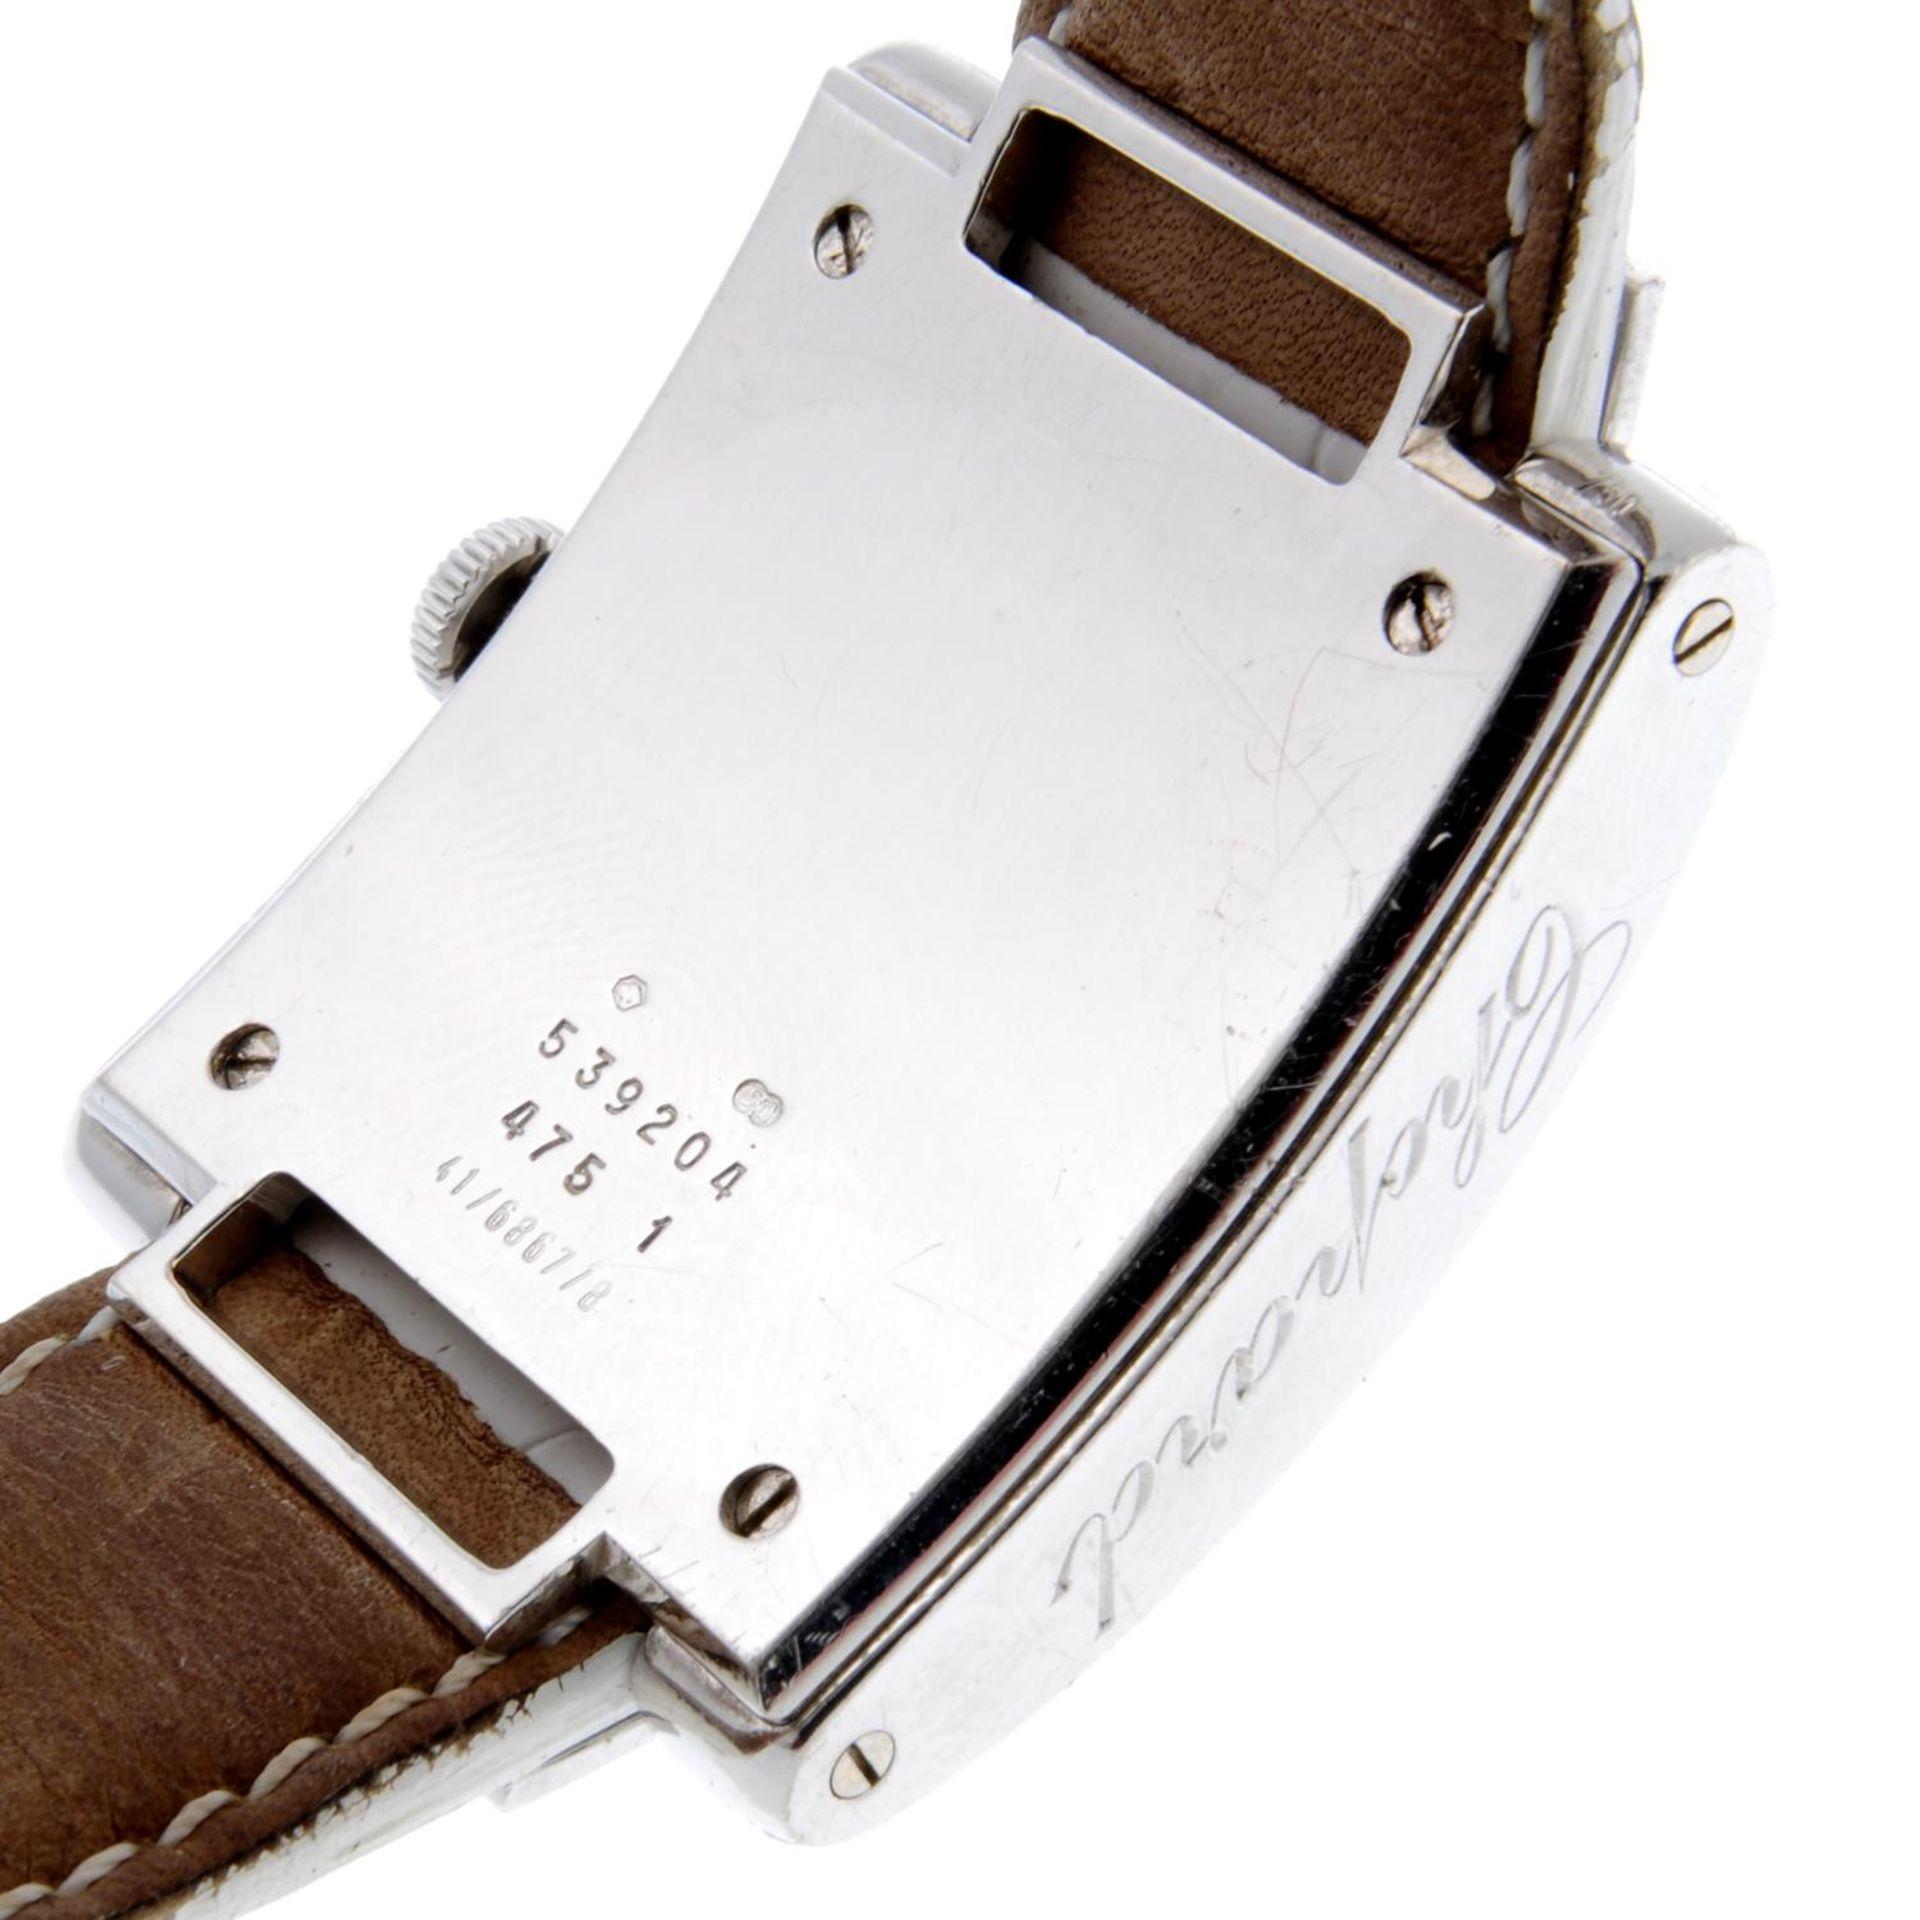 CHOPARD - a La Strada wrist watch. - Bild 5 aus 5